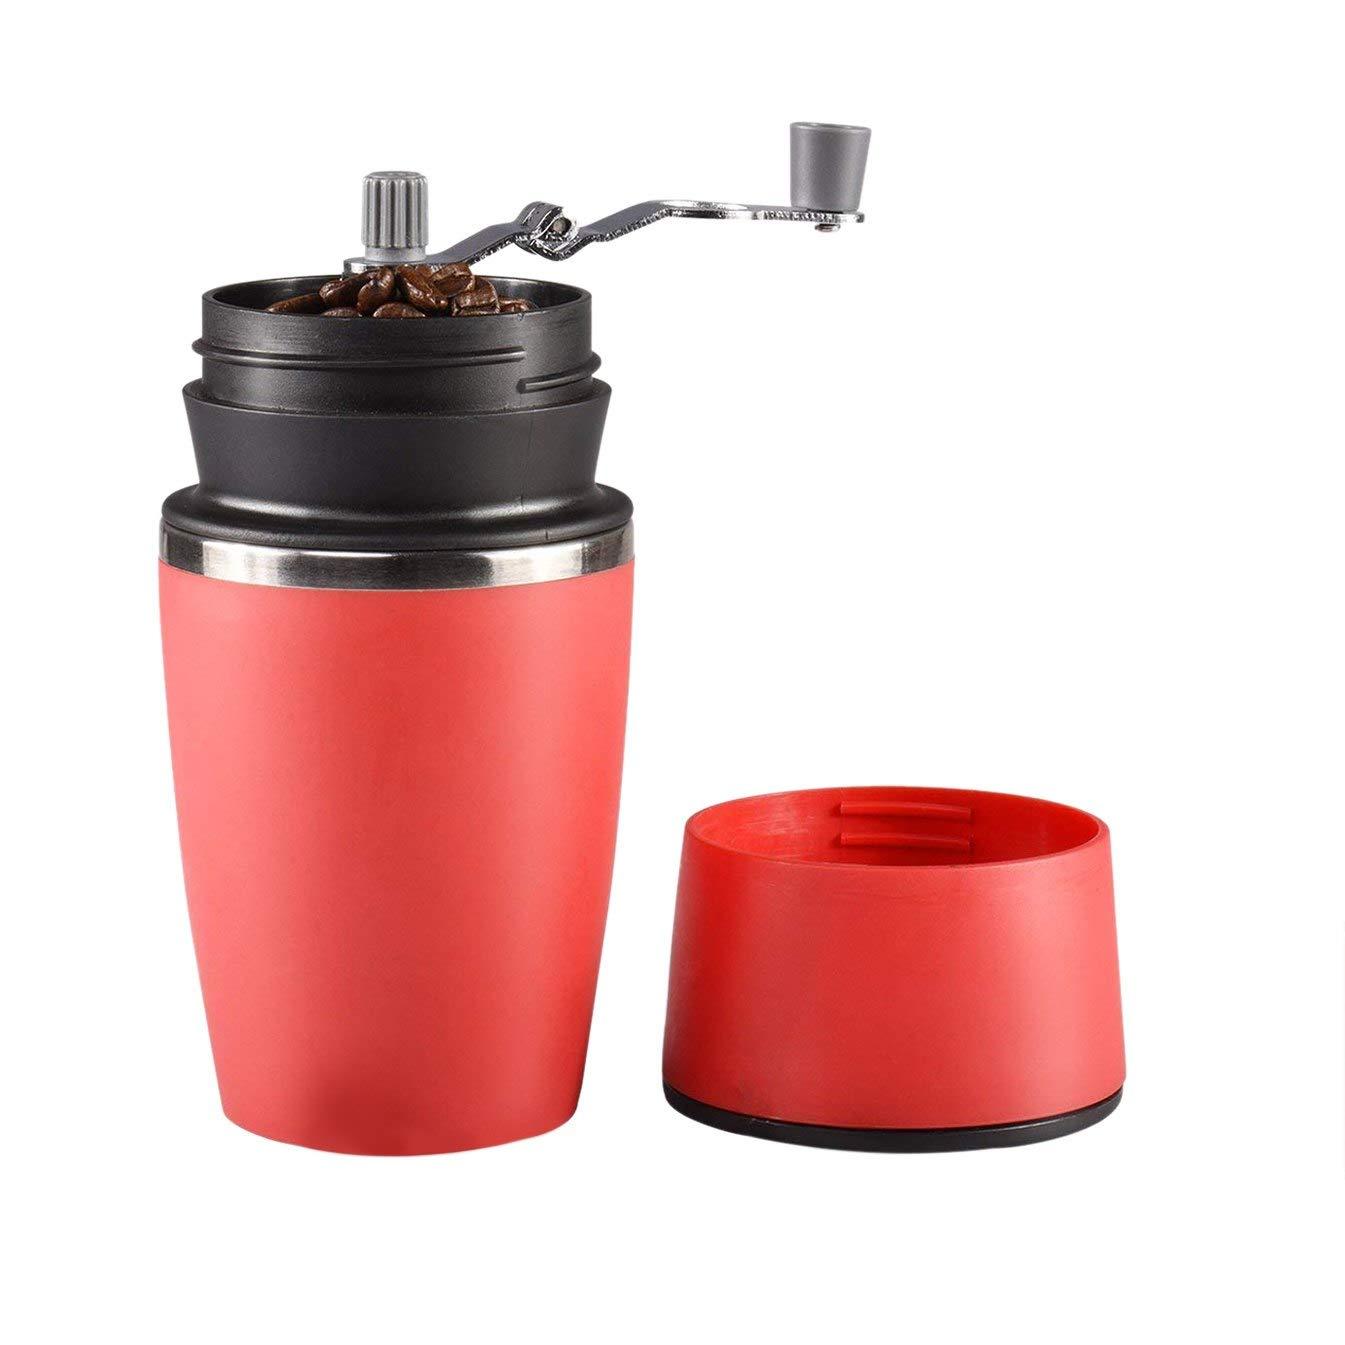 Manual Coffee Grinders - Portable Manual Coffee Grinder Adjustable Single Cup Maker Ceramic Burr Mug With Built In Grind - Prime Coffee Manual Rated Grinders